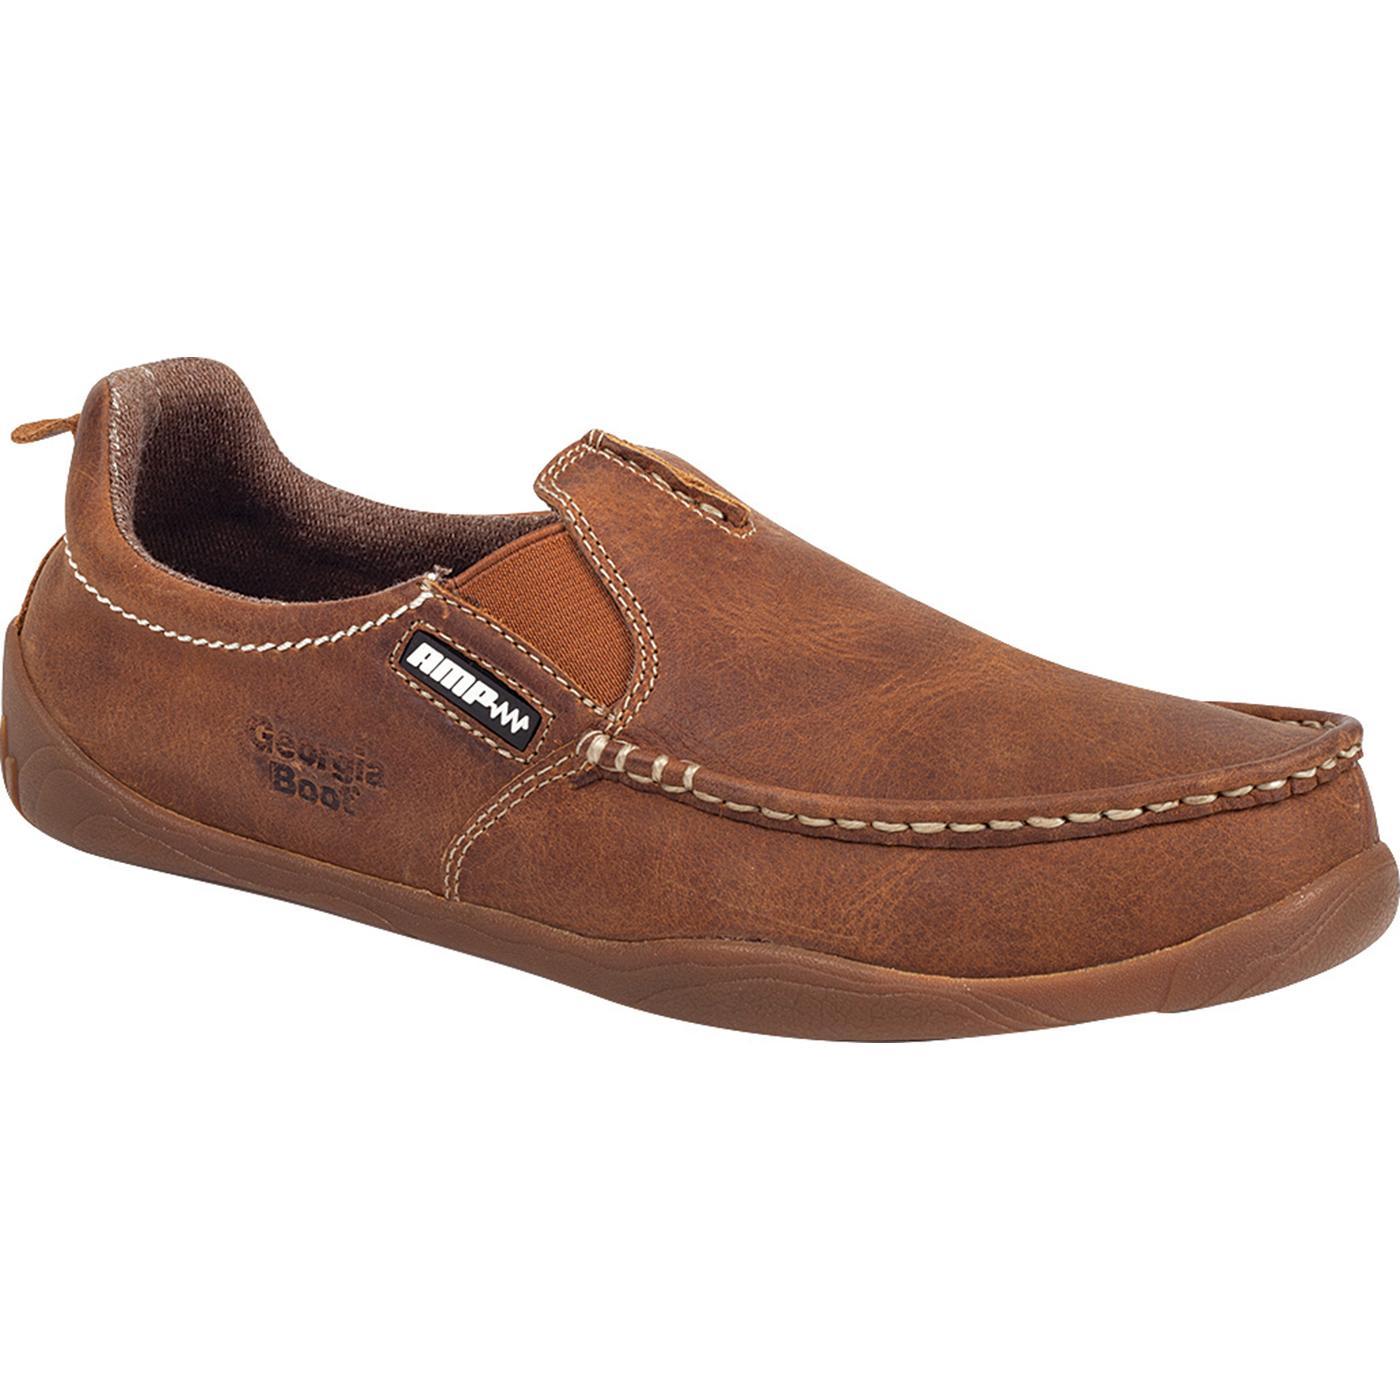 Pro.keenfootwear.com metadata updates